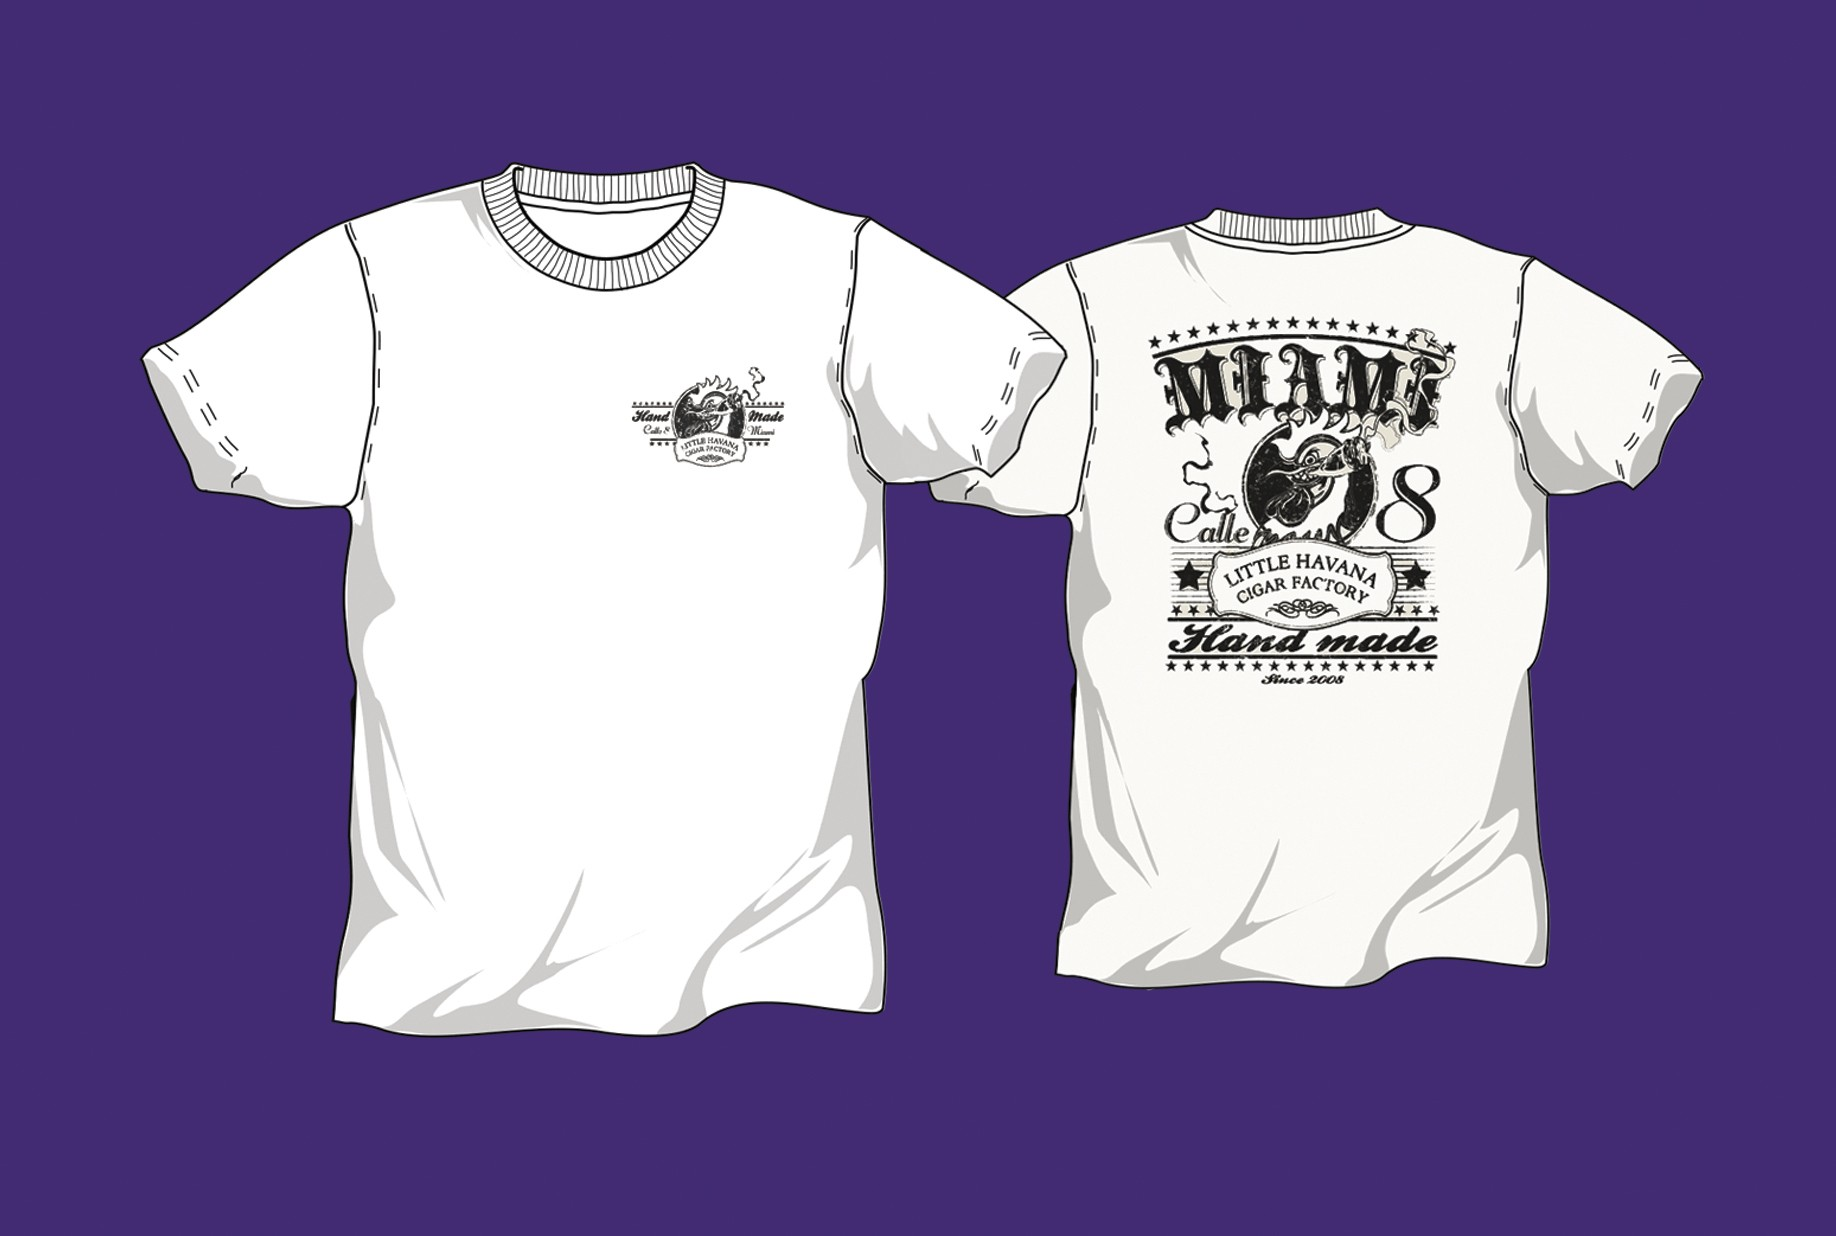 Little Havana Cigar Factory - Gallo White T-Shirt